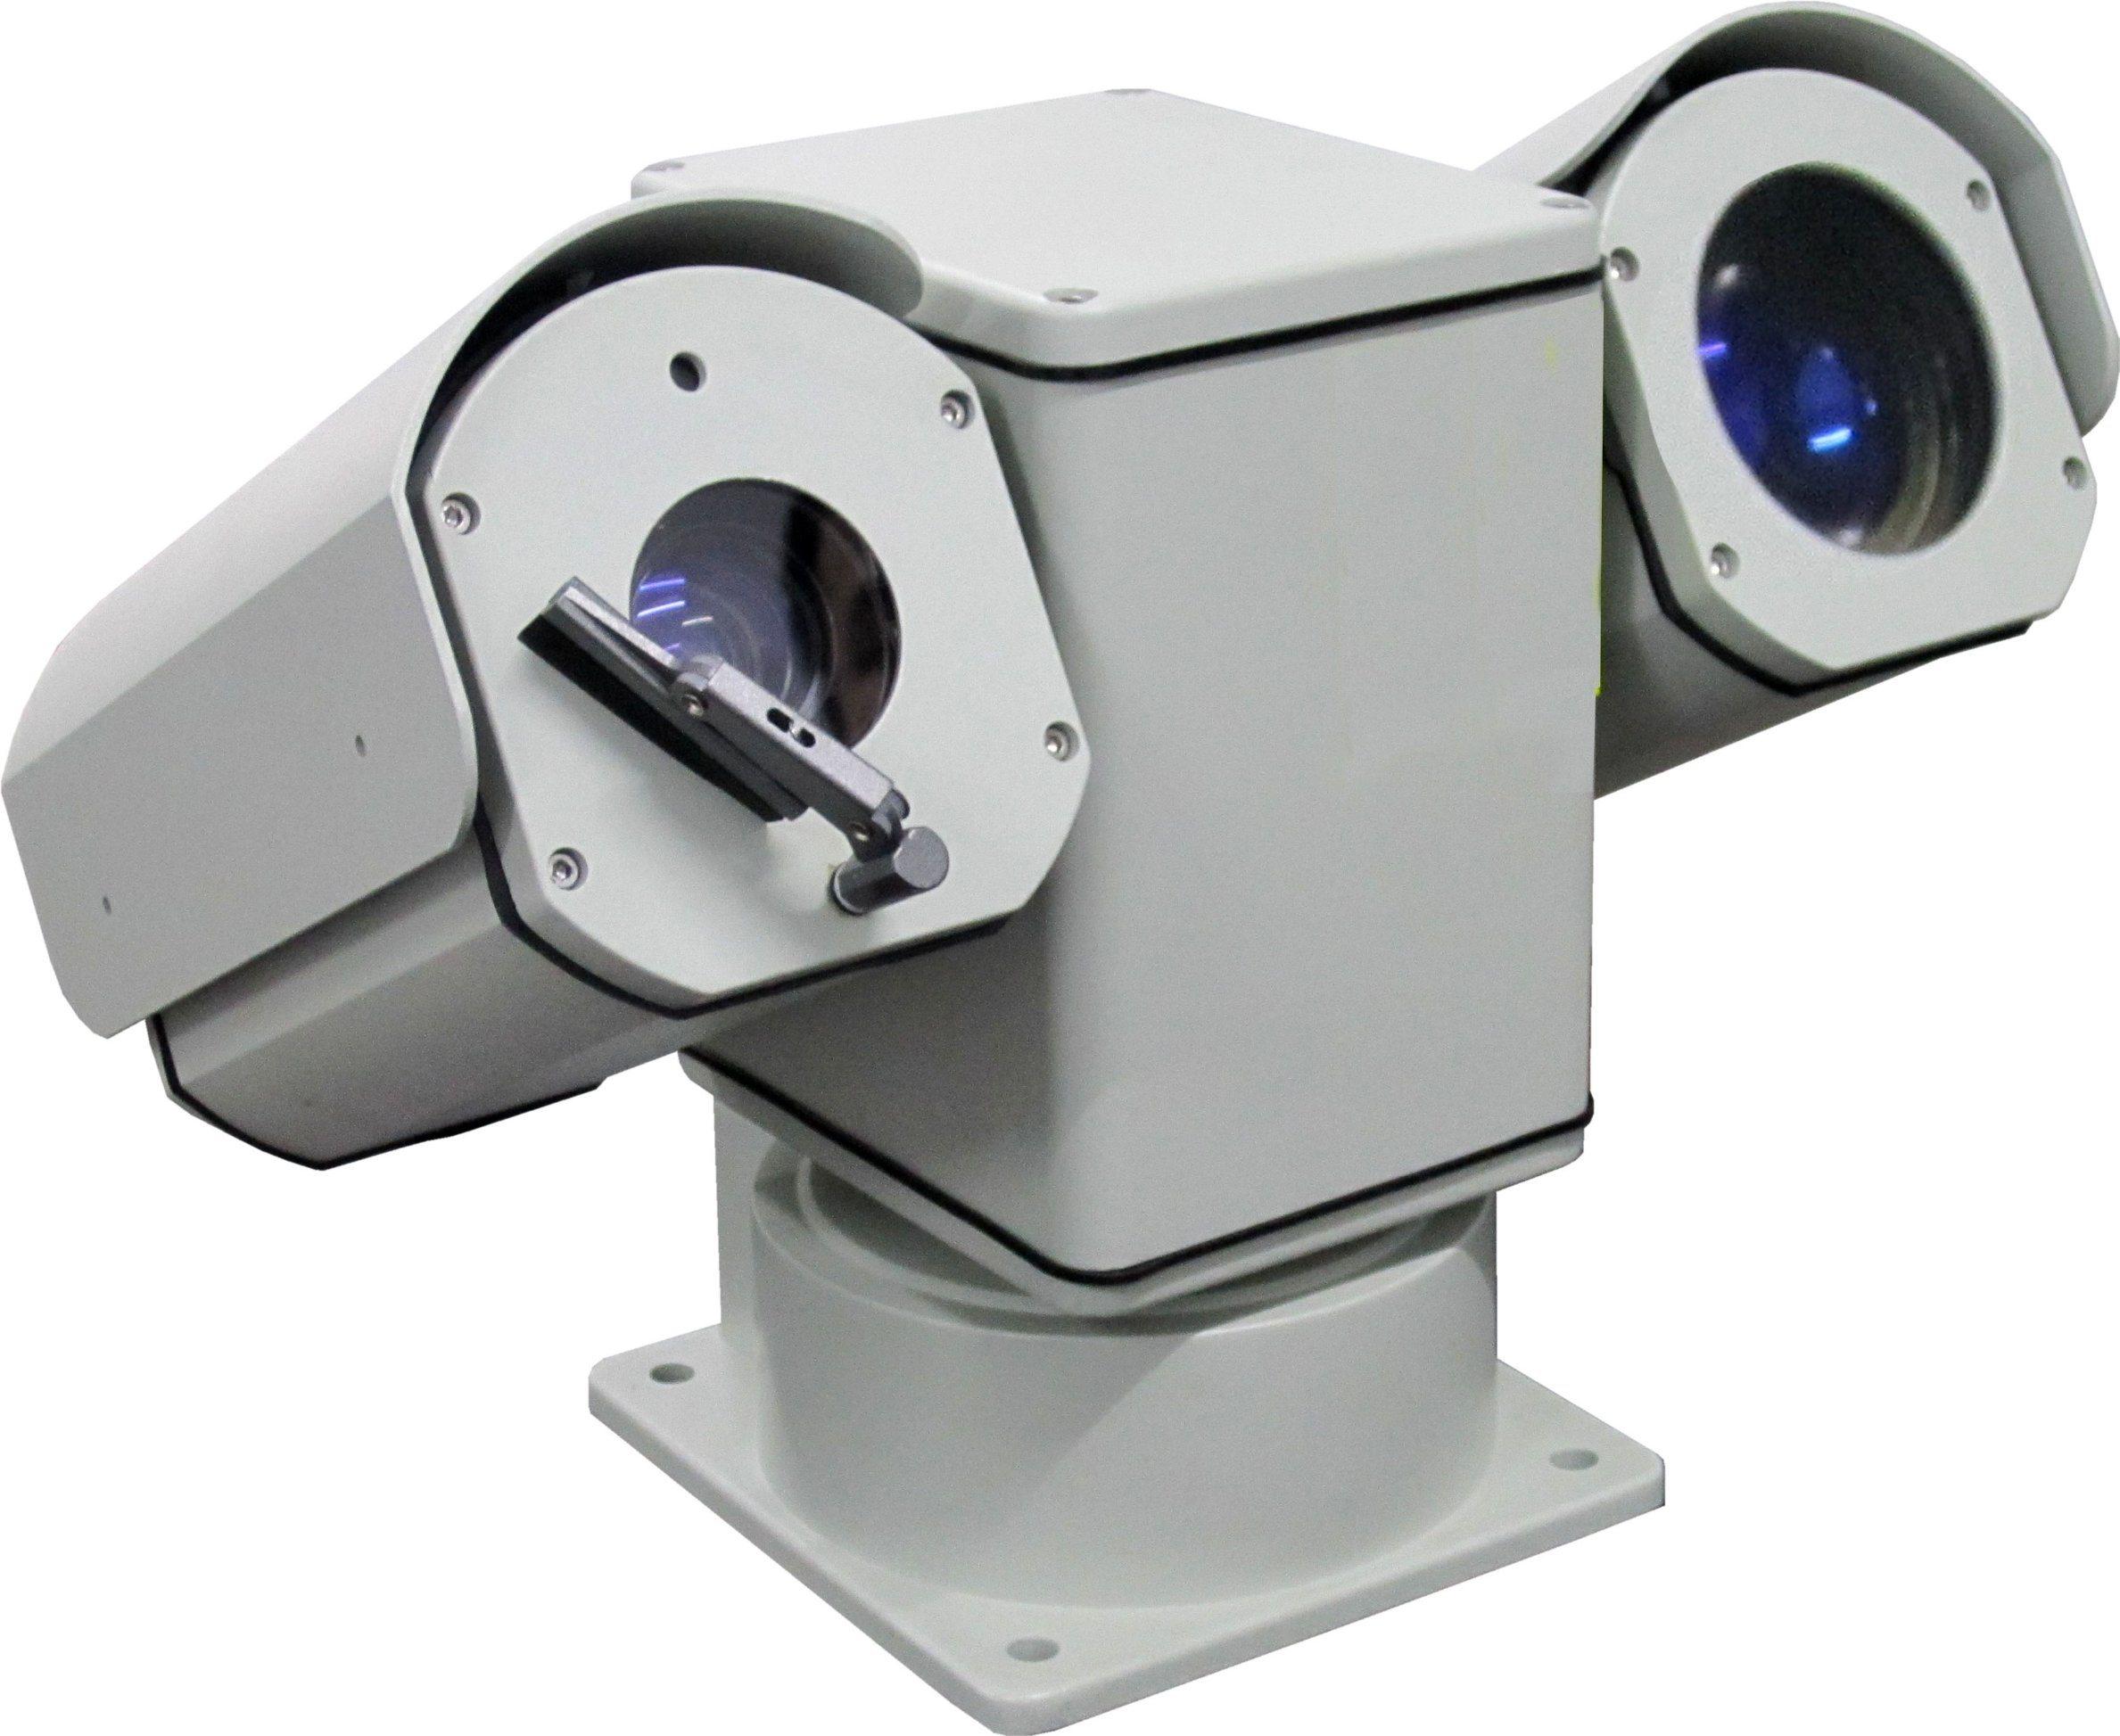 El peso de la luz exterior 30X HD 4K@15fps cámara PTZ Láser 1km